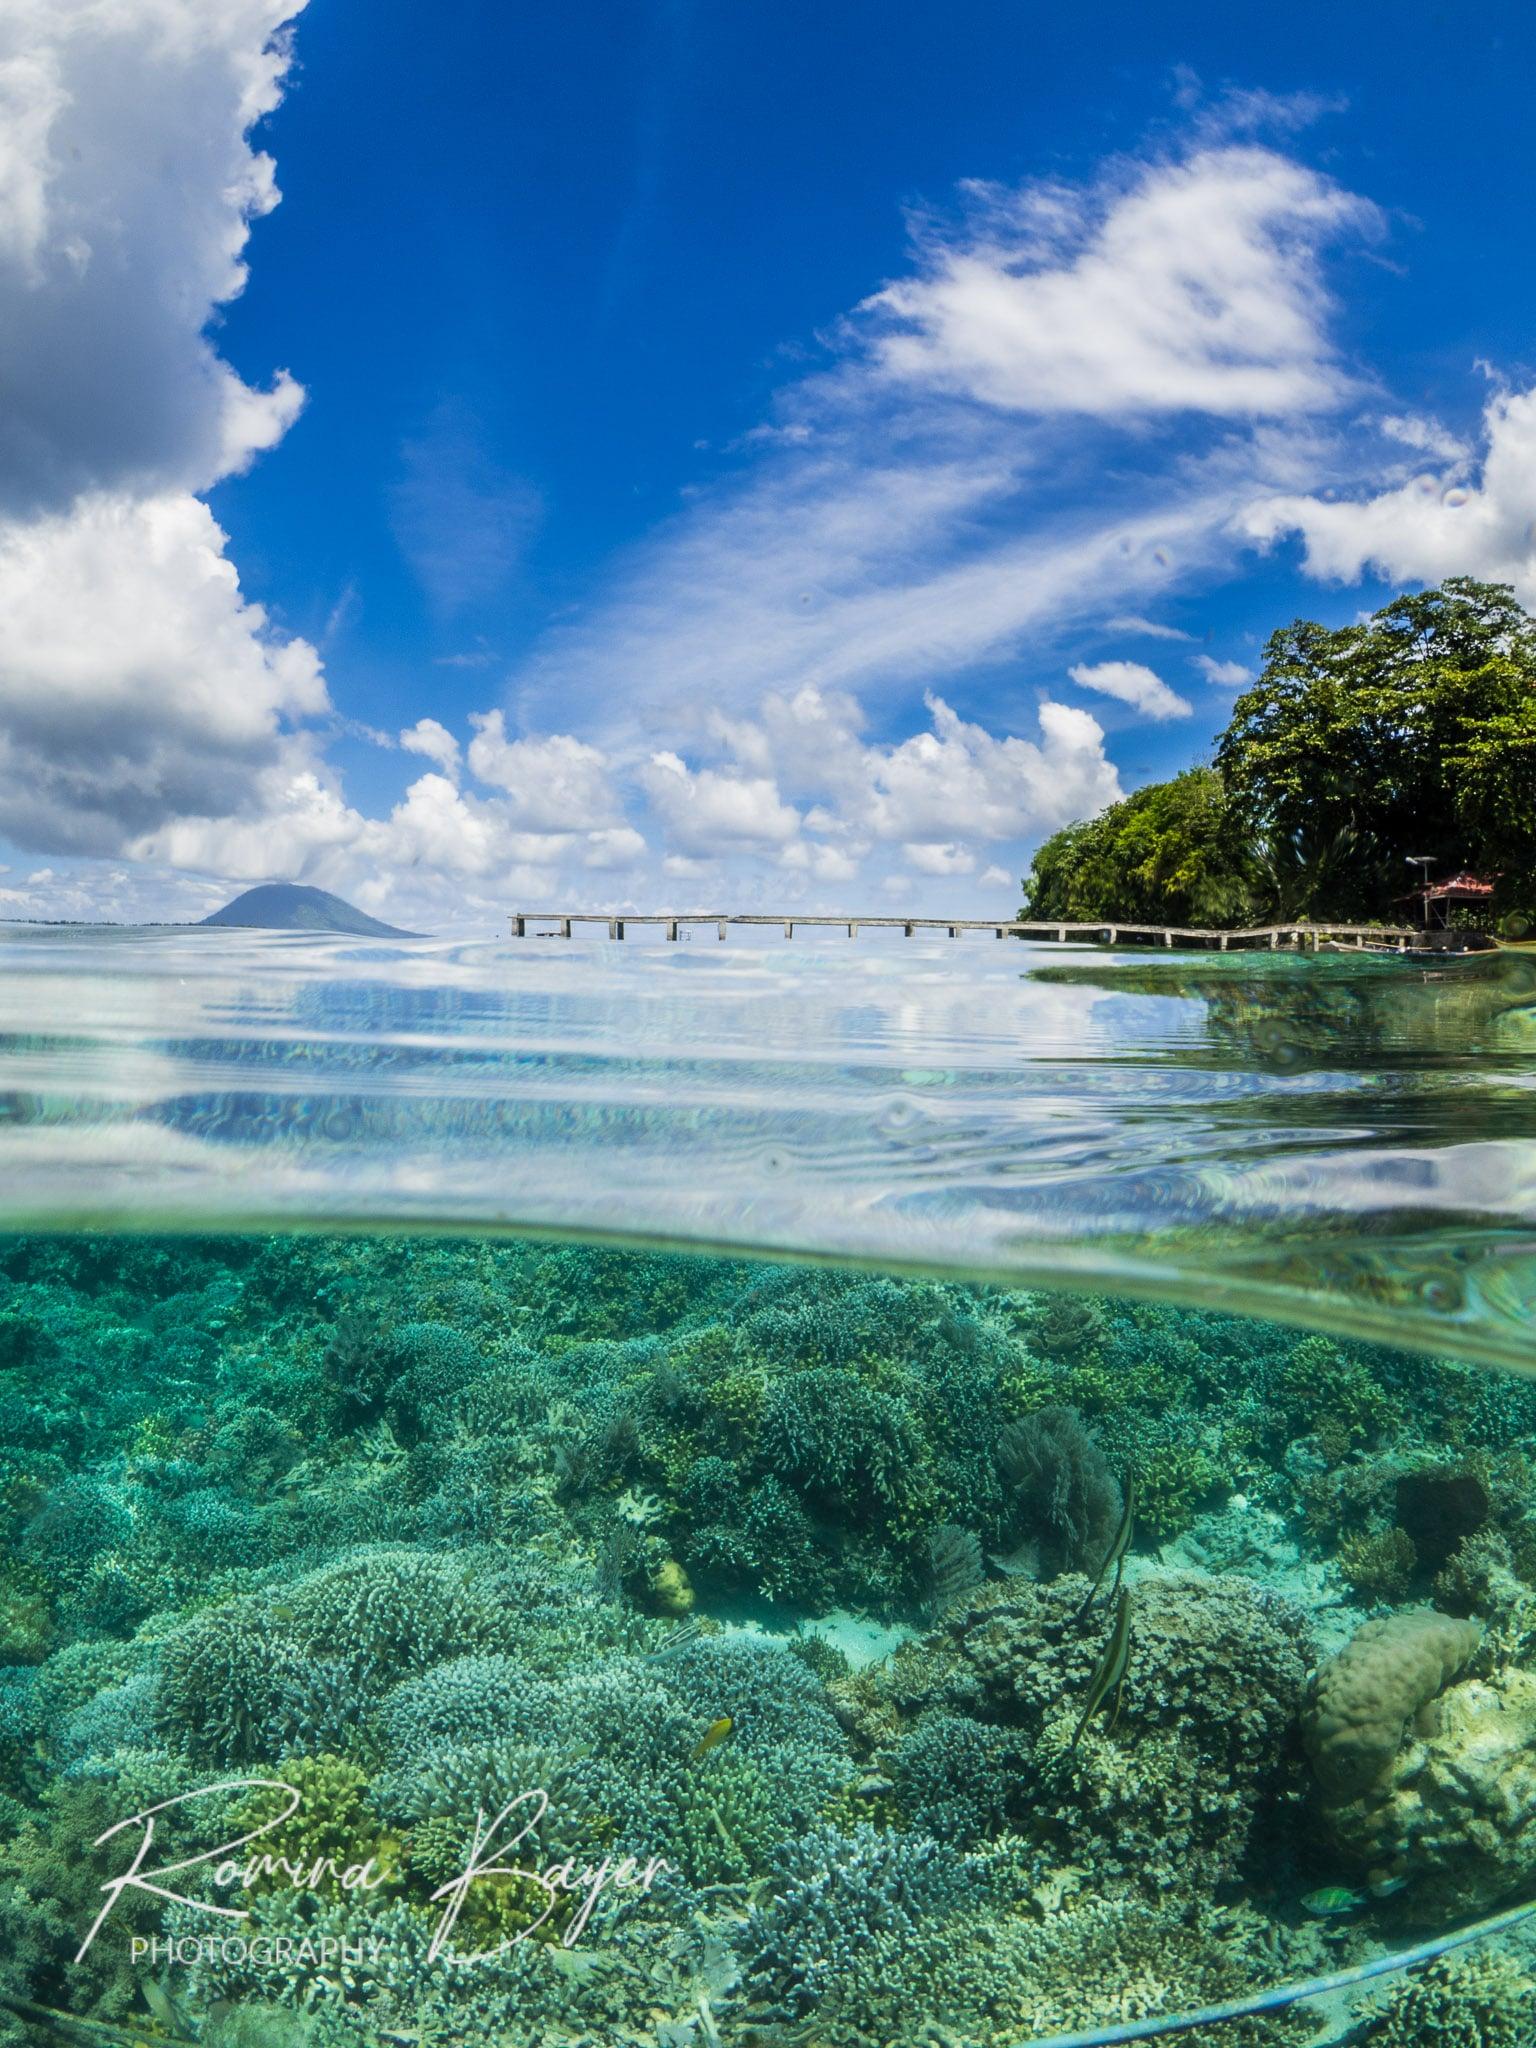 Split shot of a coral reef in Siladen